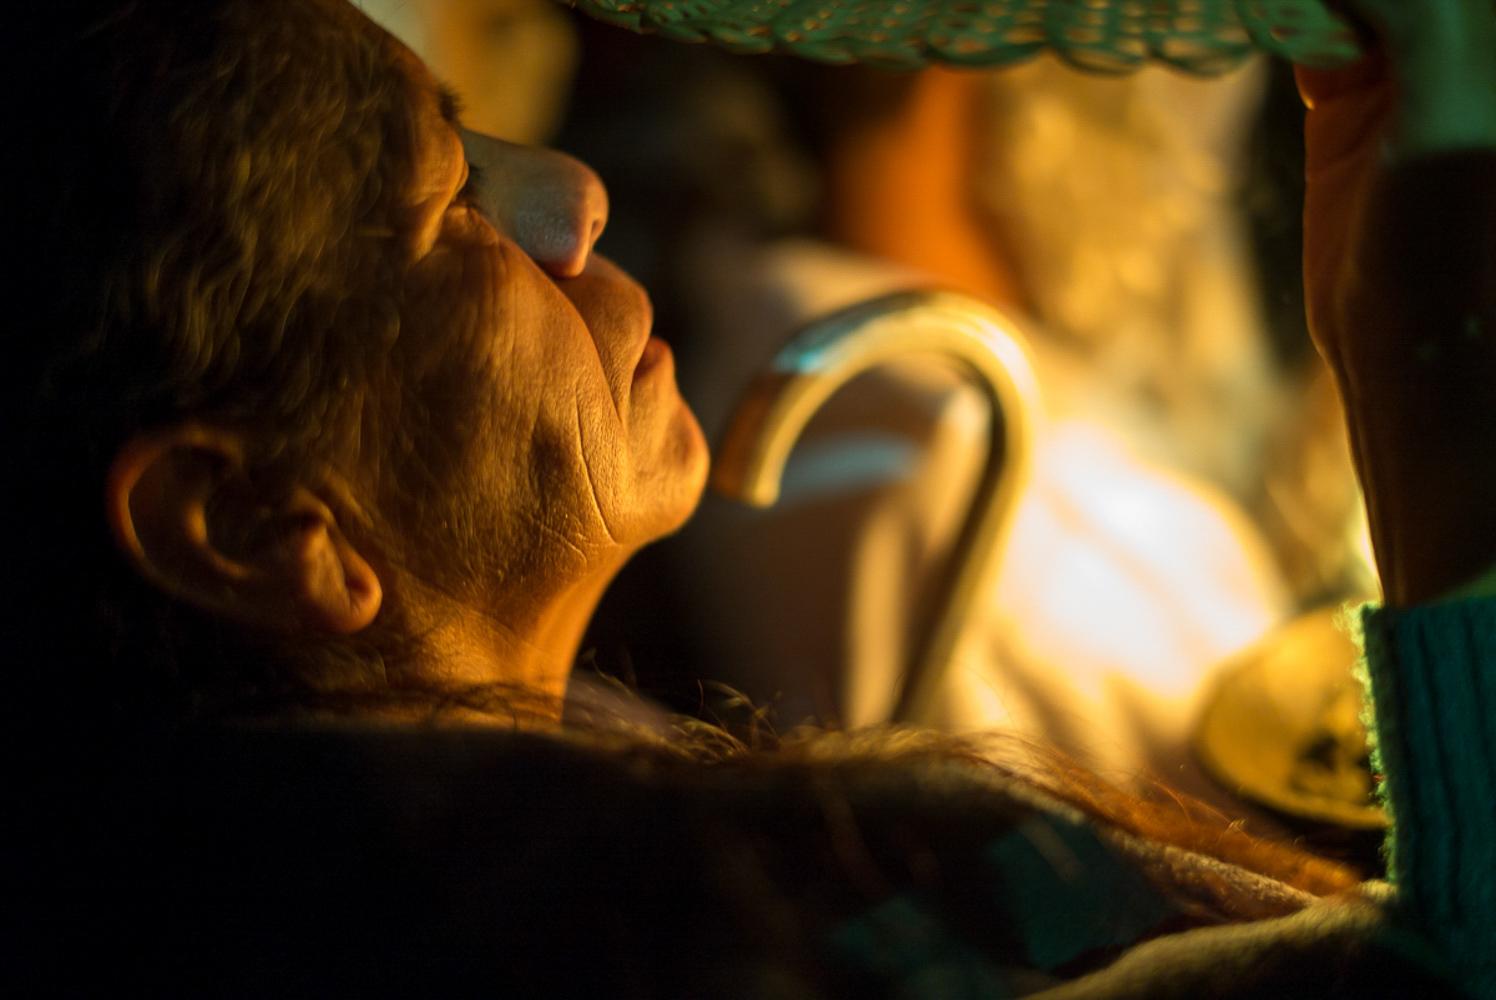 Dia_de_los_Muertos_Woman_Ceremony_Day_of_the_dead_DOD_Oaxaca_photo_workshop-53.jpg